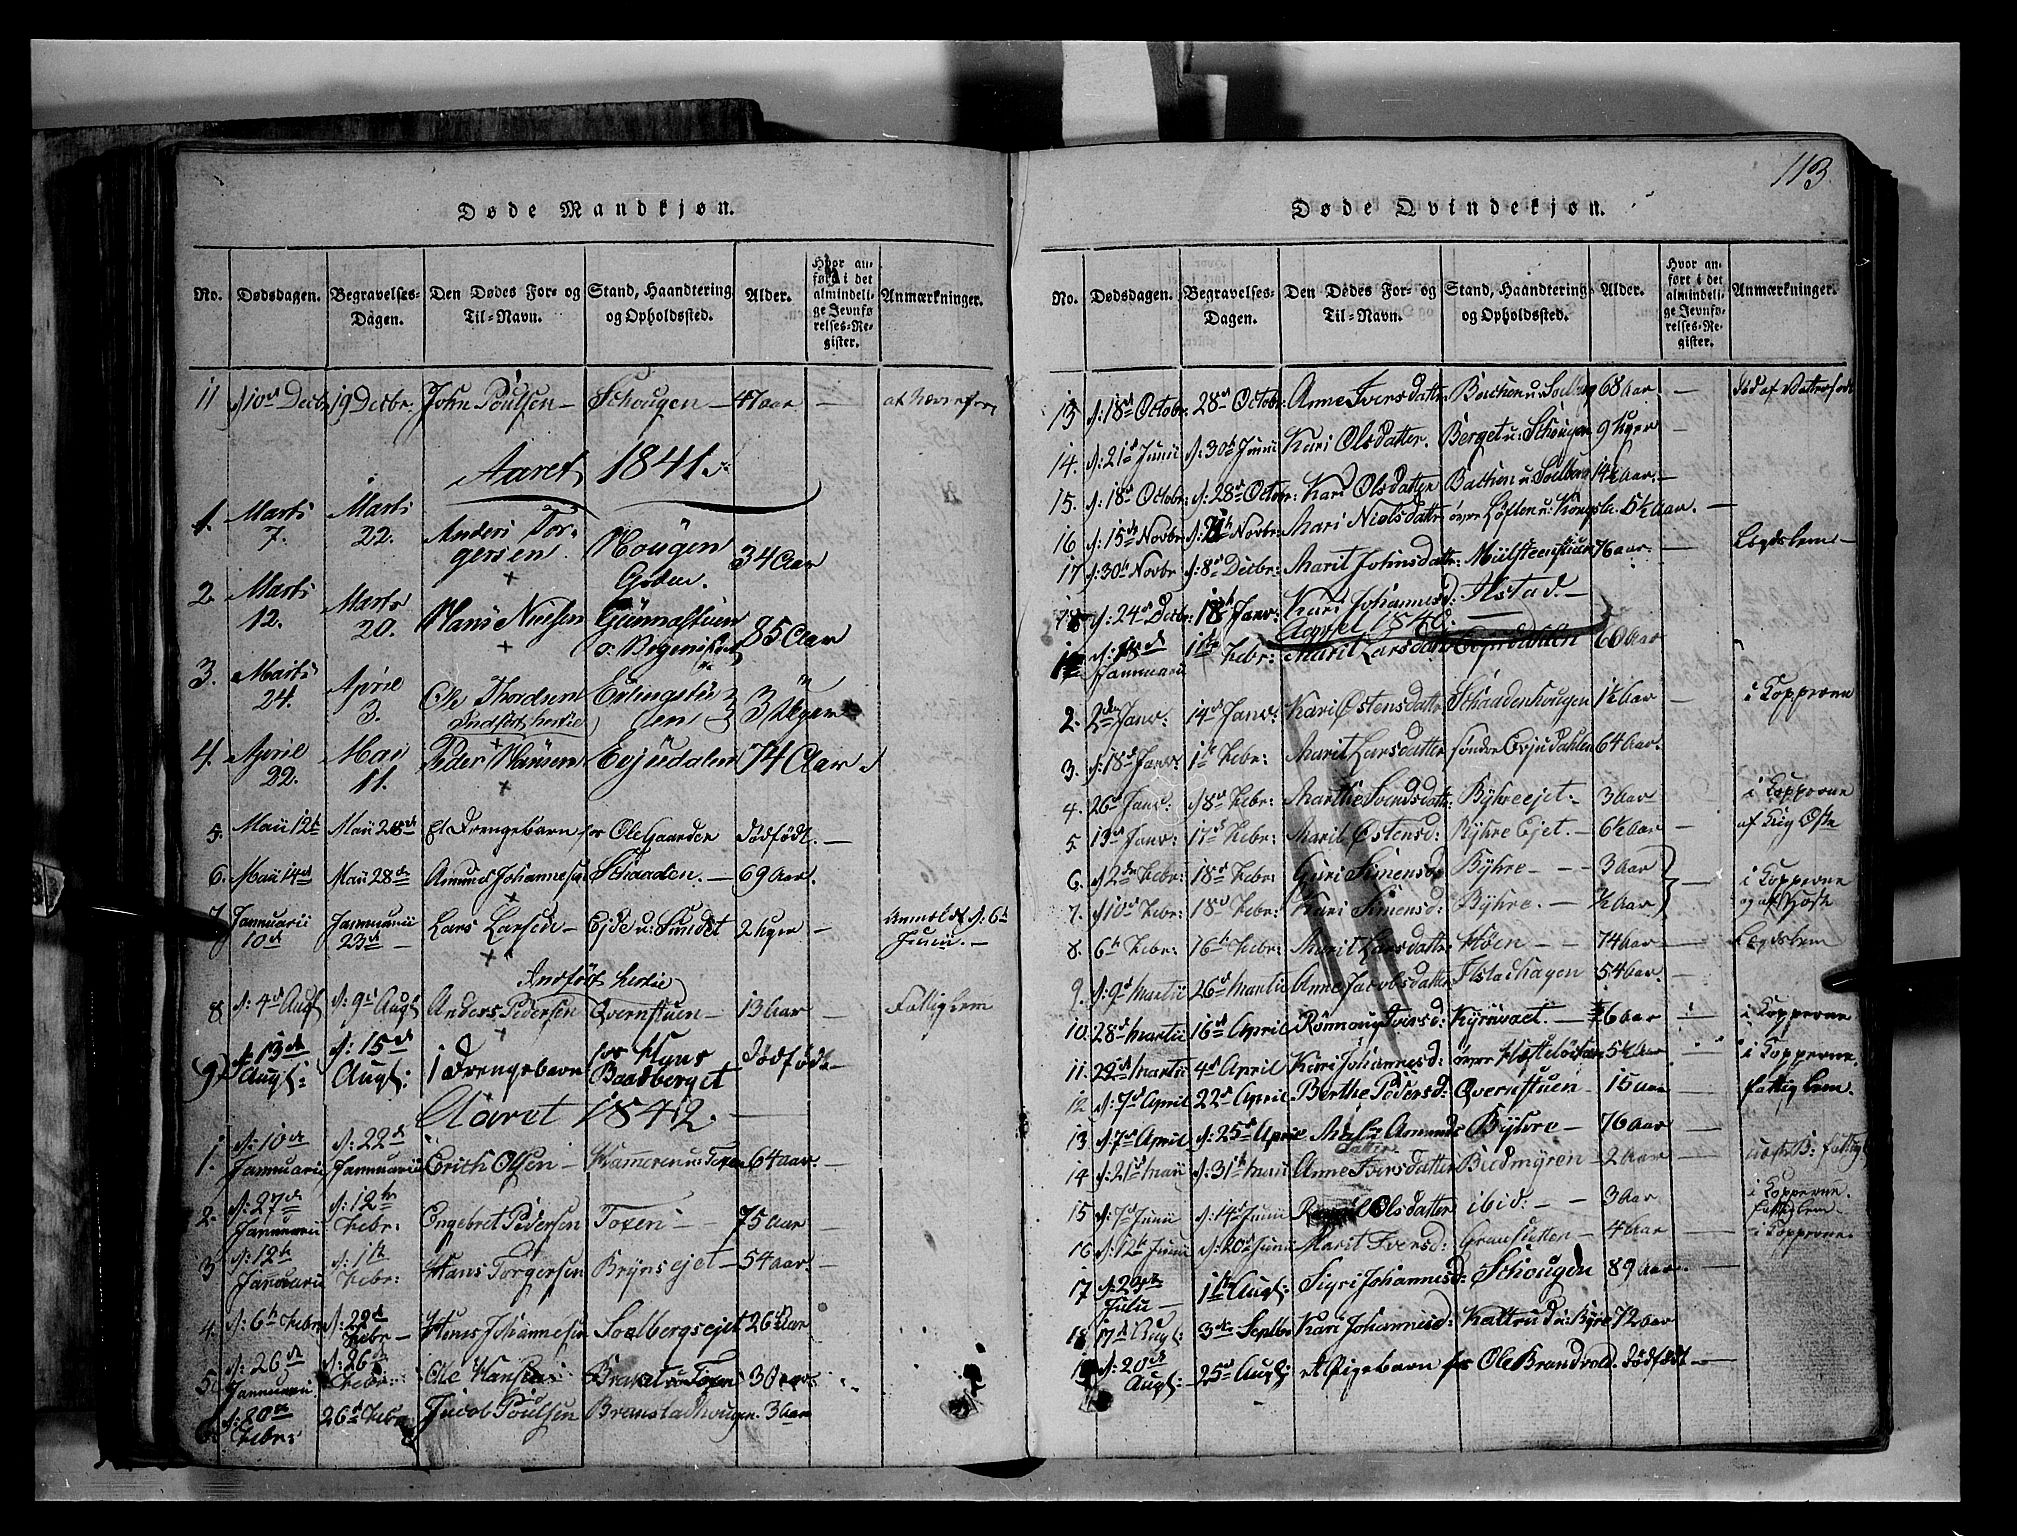 SAH, Fron prestekontor, H/Ha/Hab/L0004: Klokkerbok nr. 4, 1816-1850, s. 113